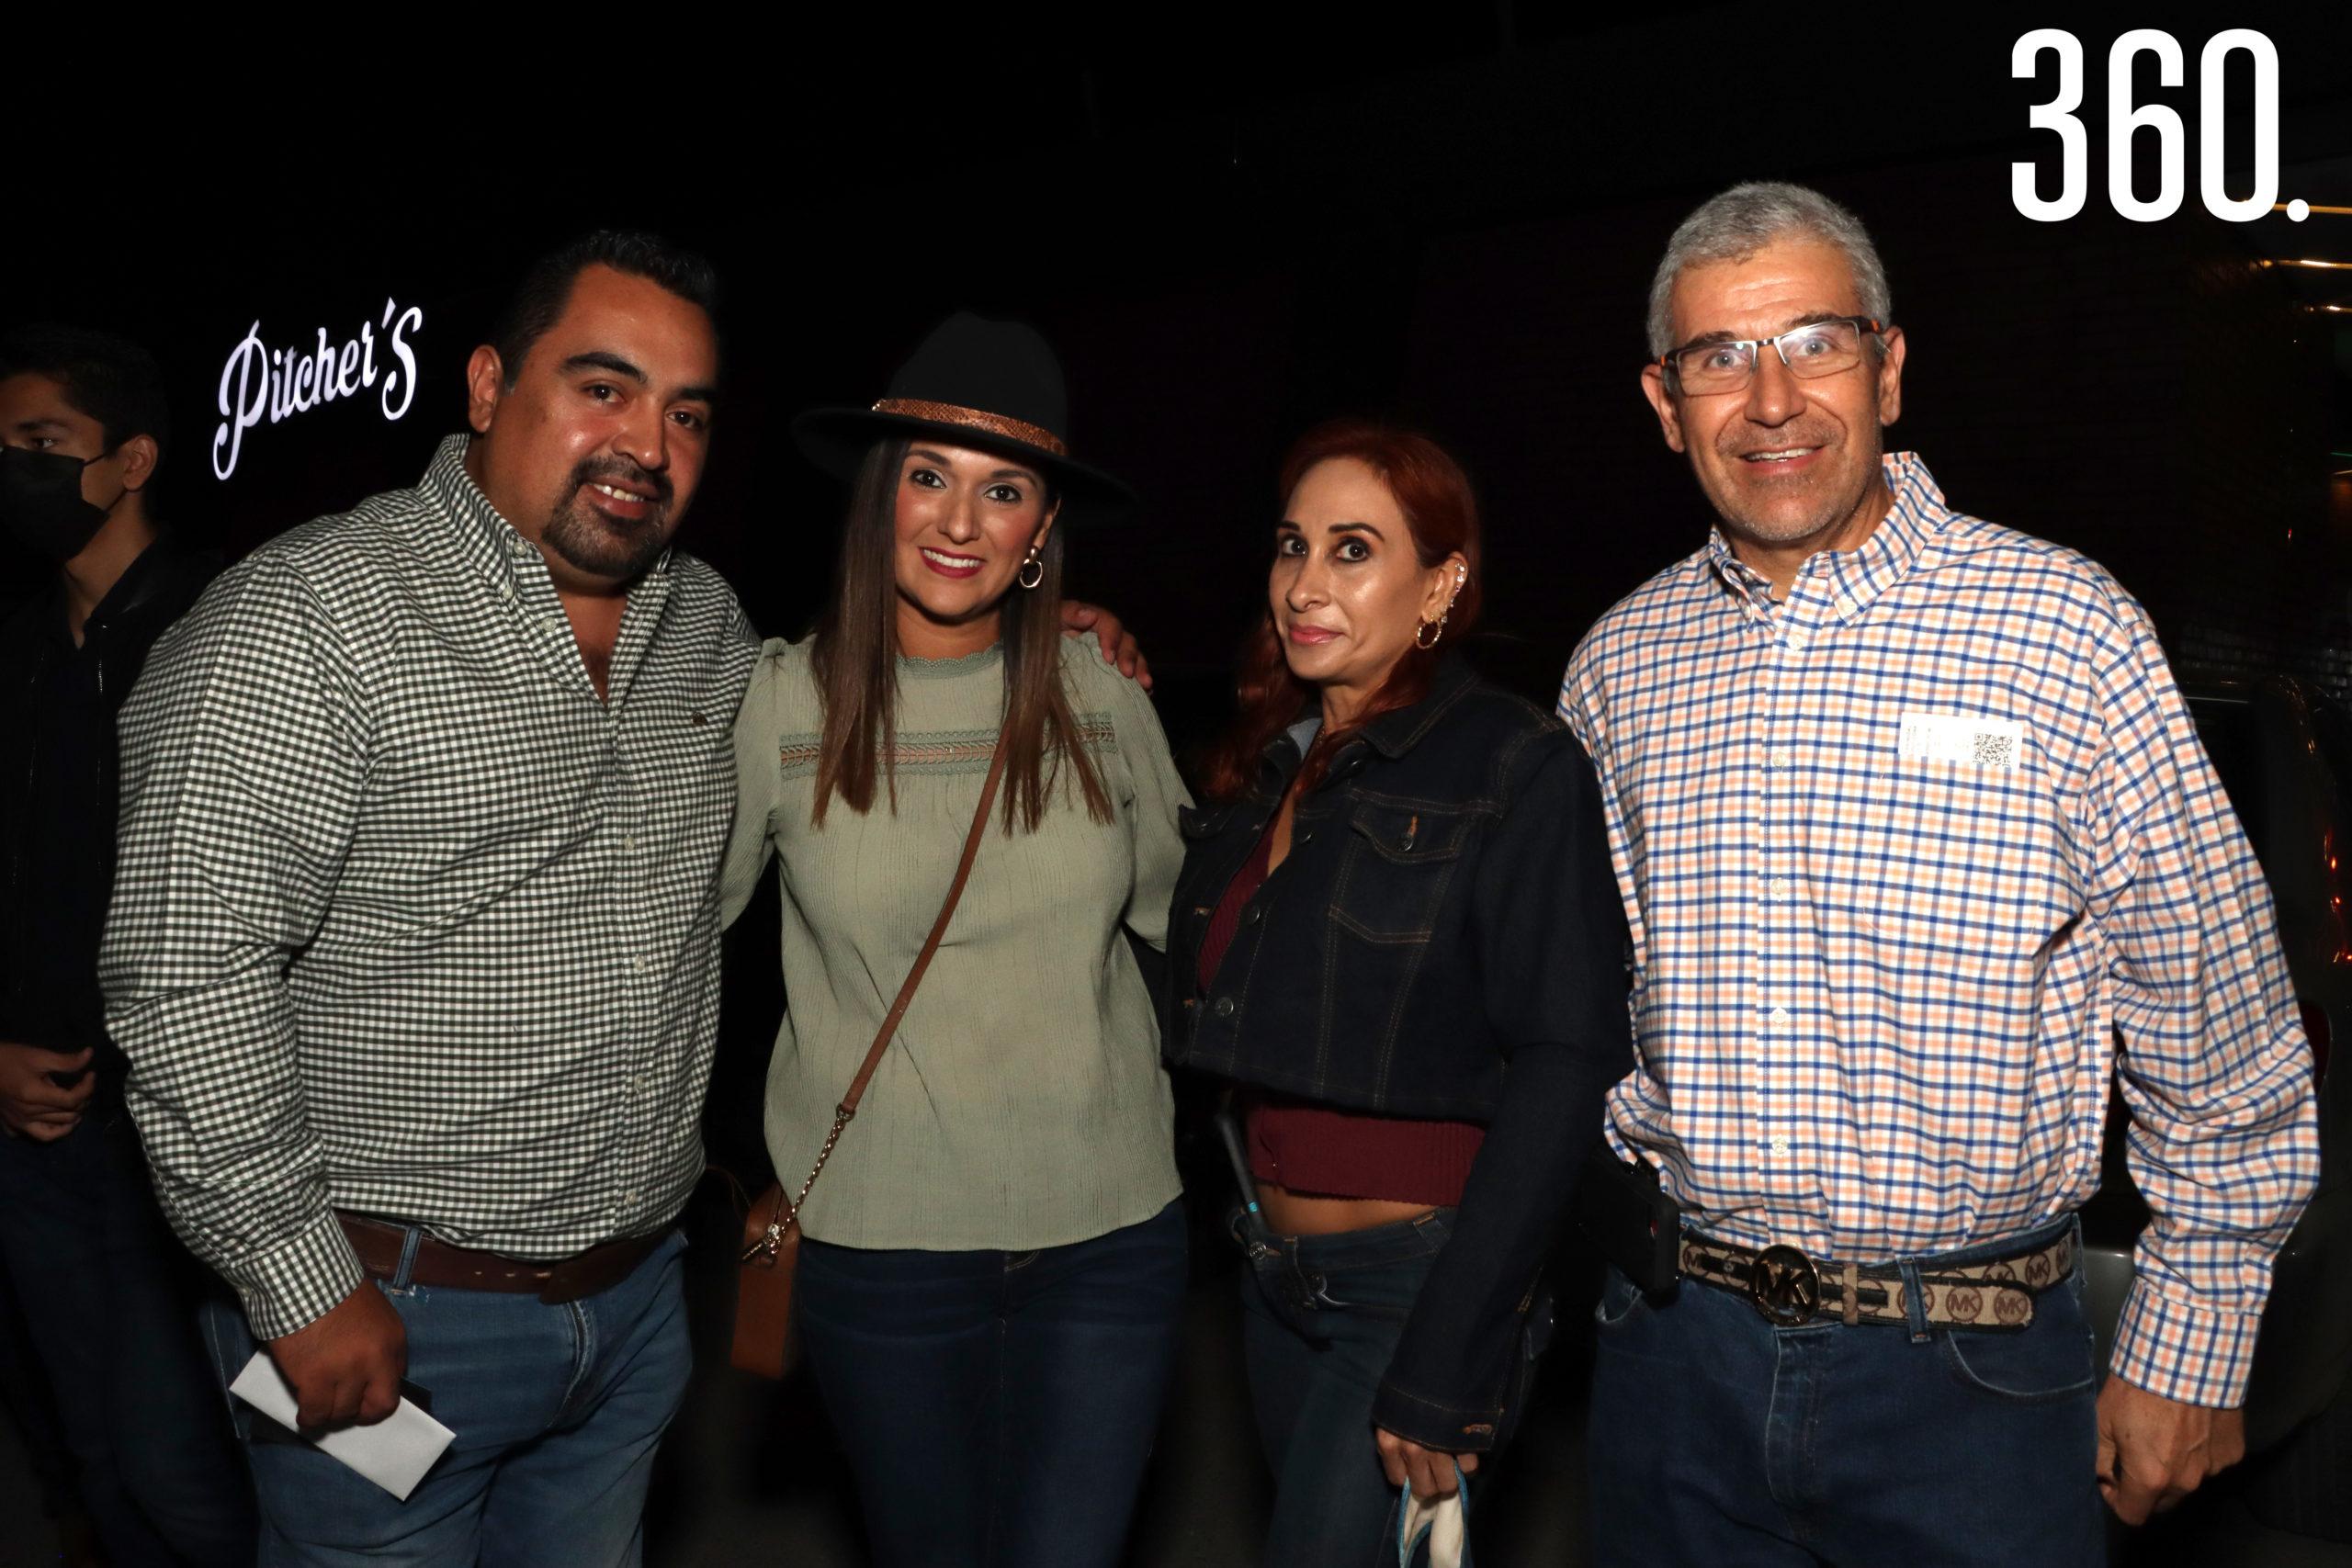 Diego Sánchez, Lilian González, Mirtha Castillo y Enrique Rodríguez.